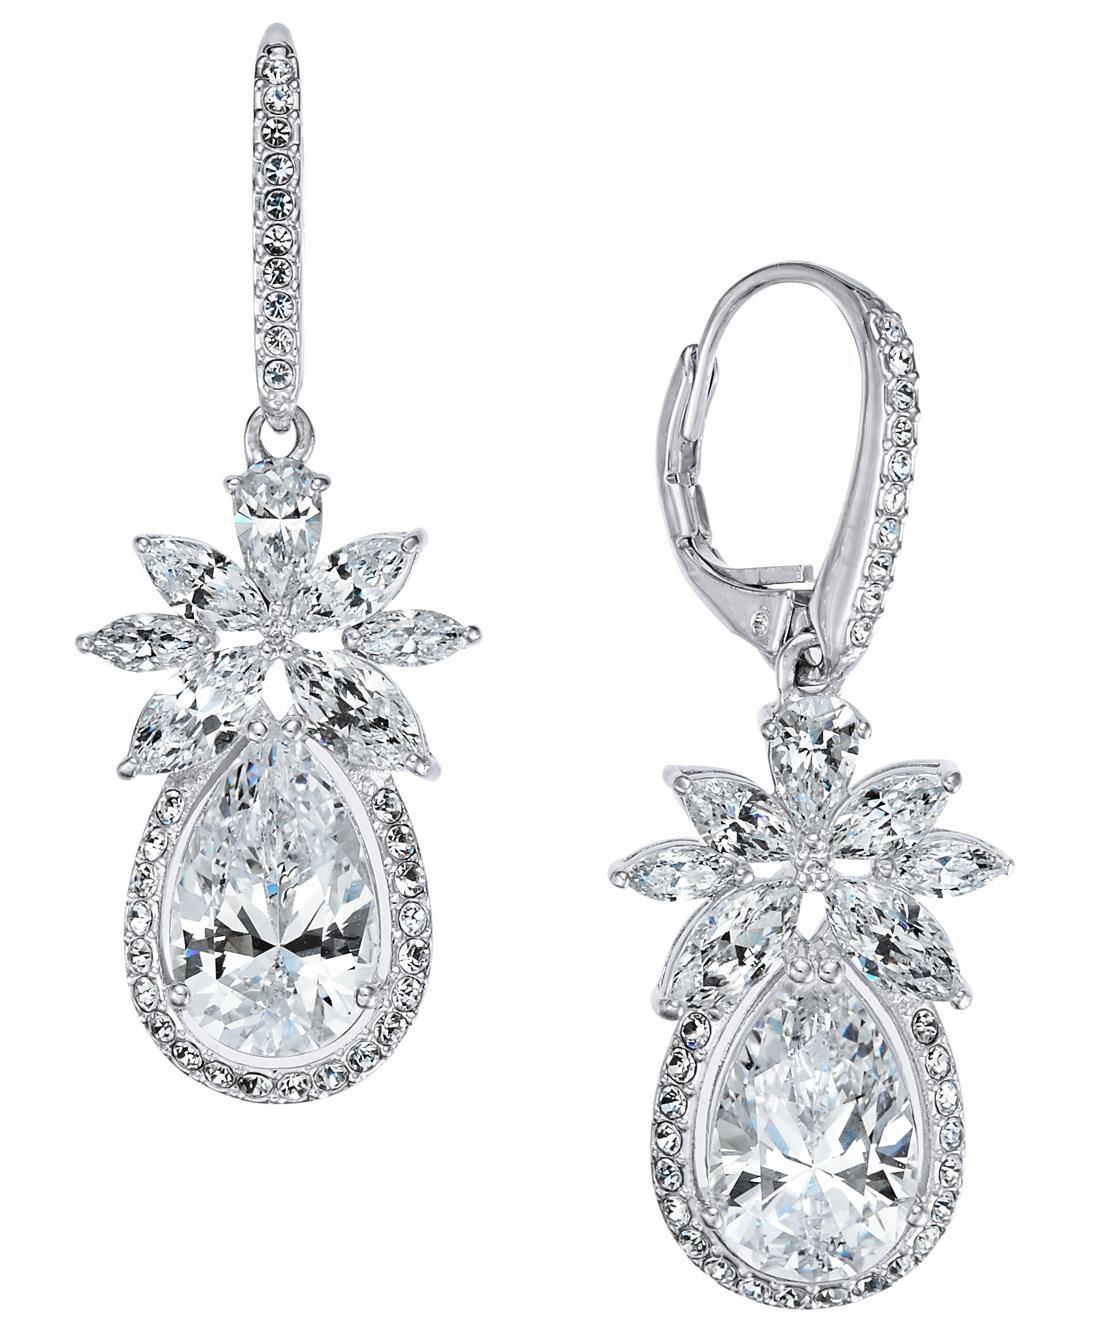 danori_diamonds_earringsimages.jpg